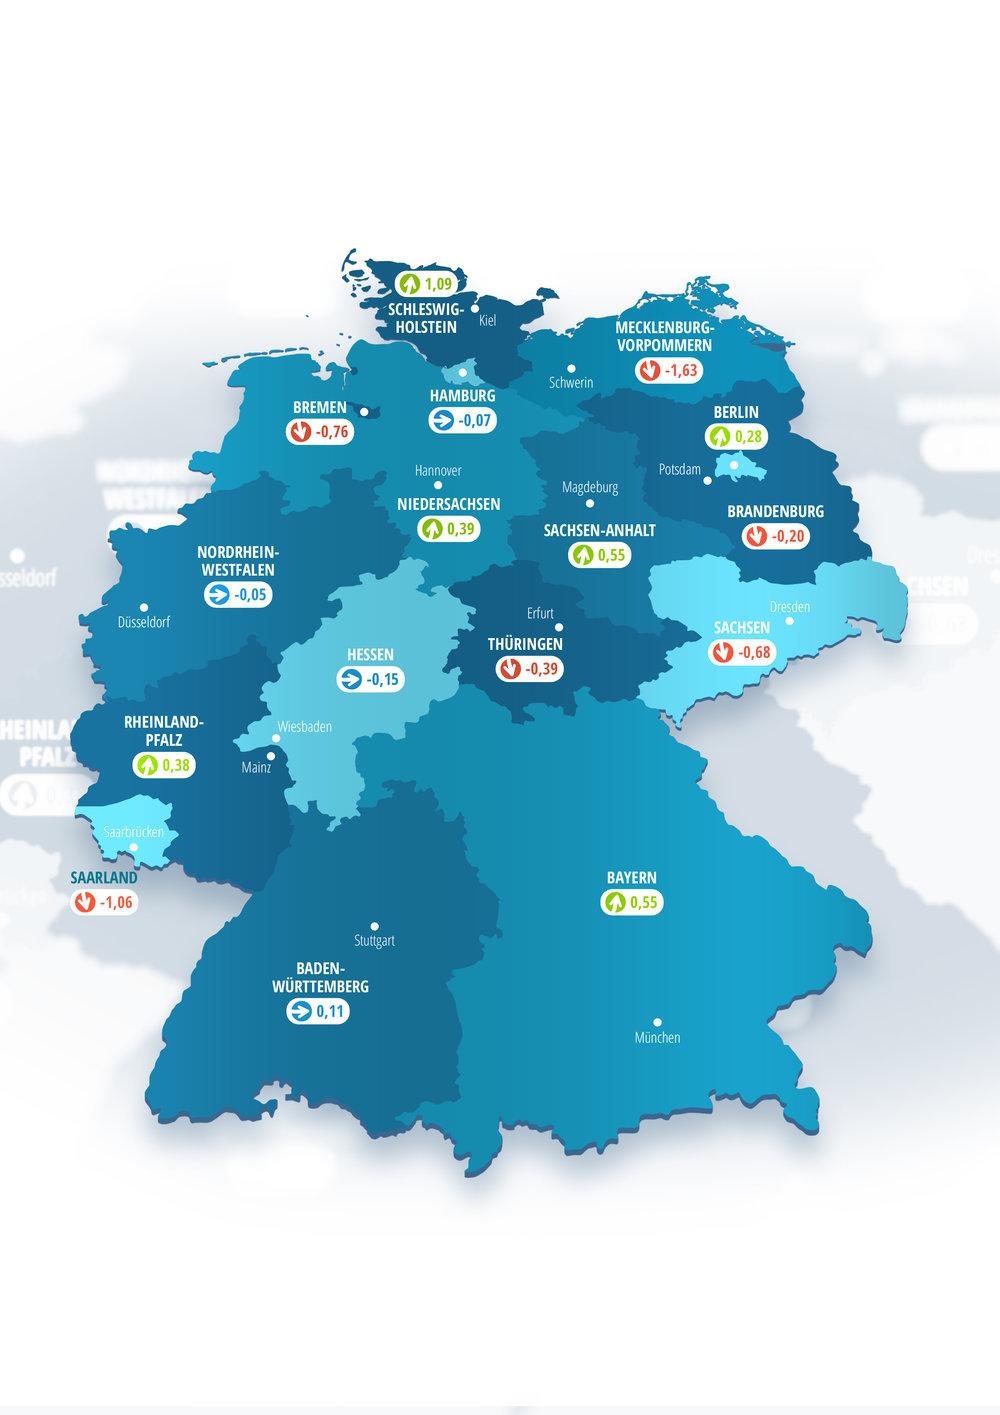 mimi_infographic_Germany_map.jpg